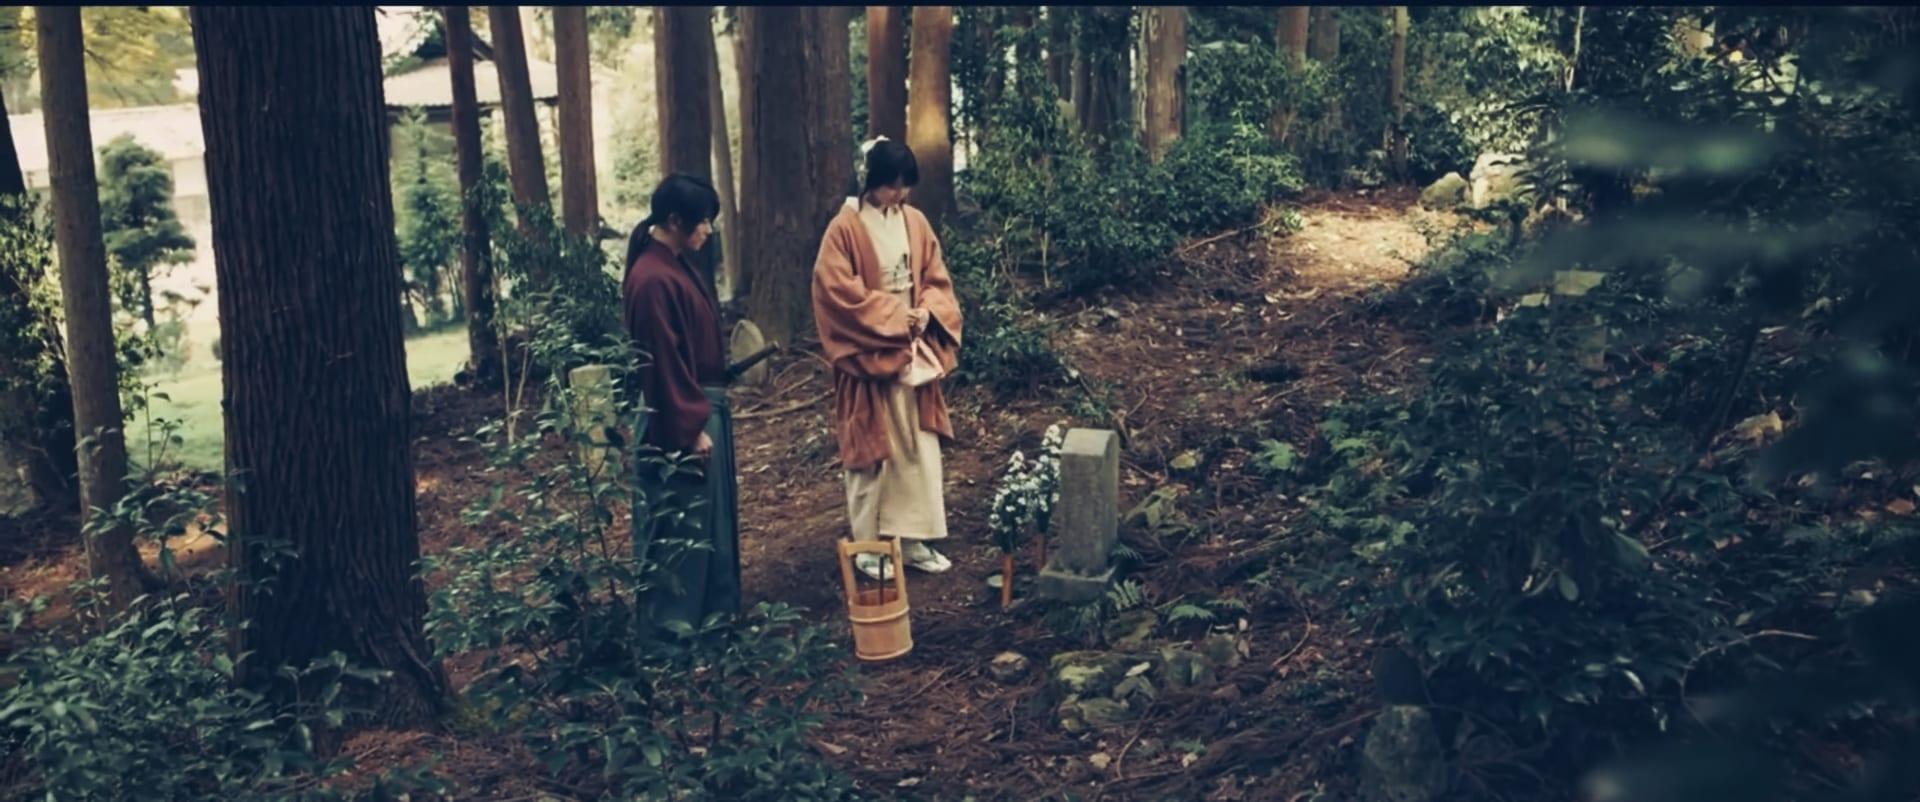 kaoru and Kenshin visit Tomoe grave